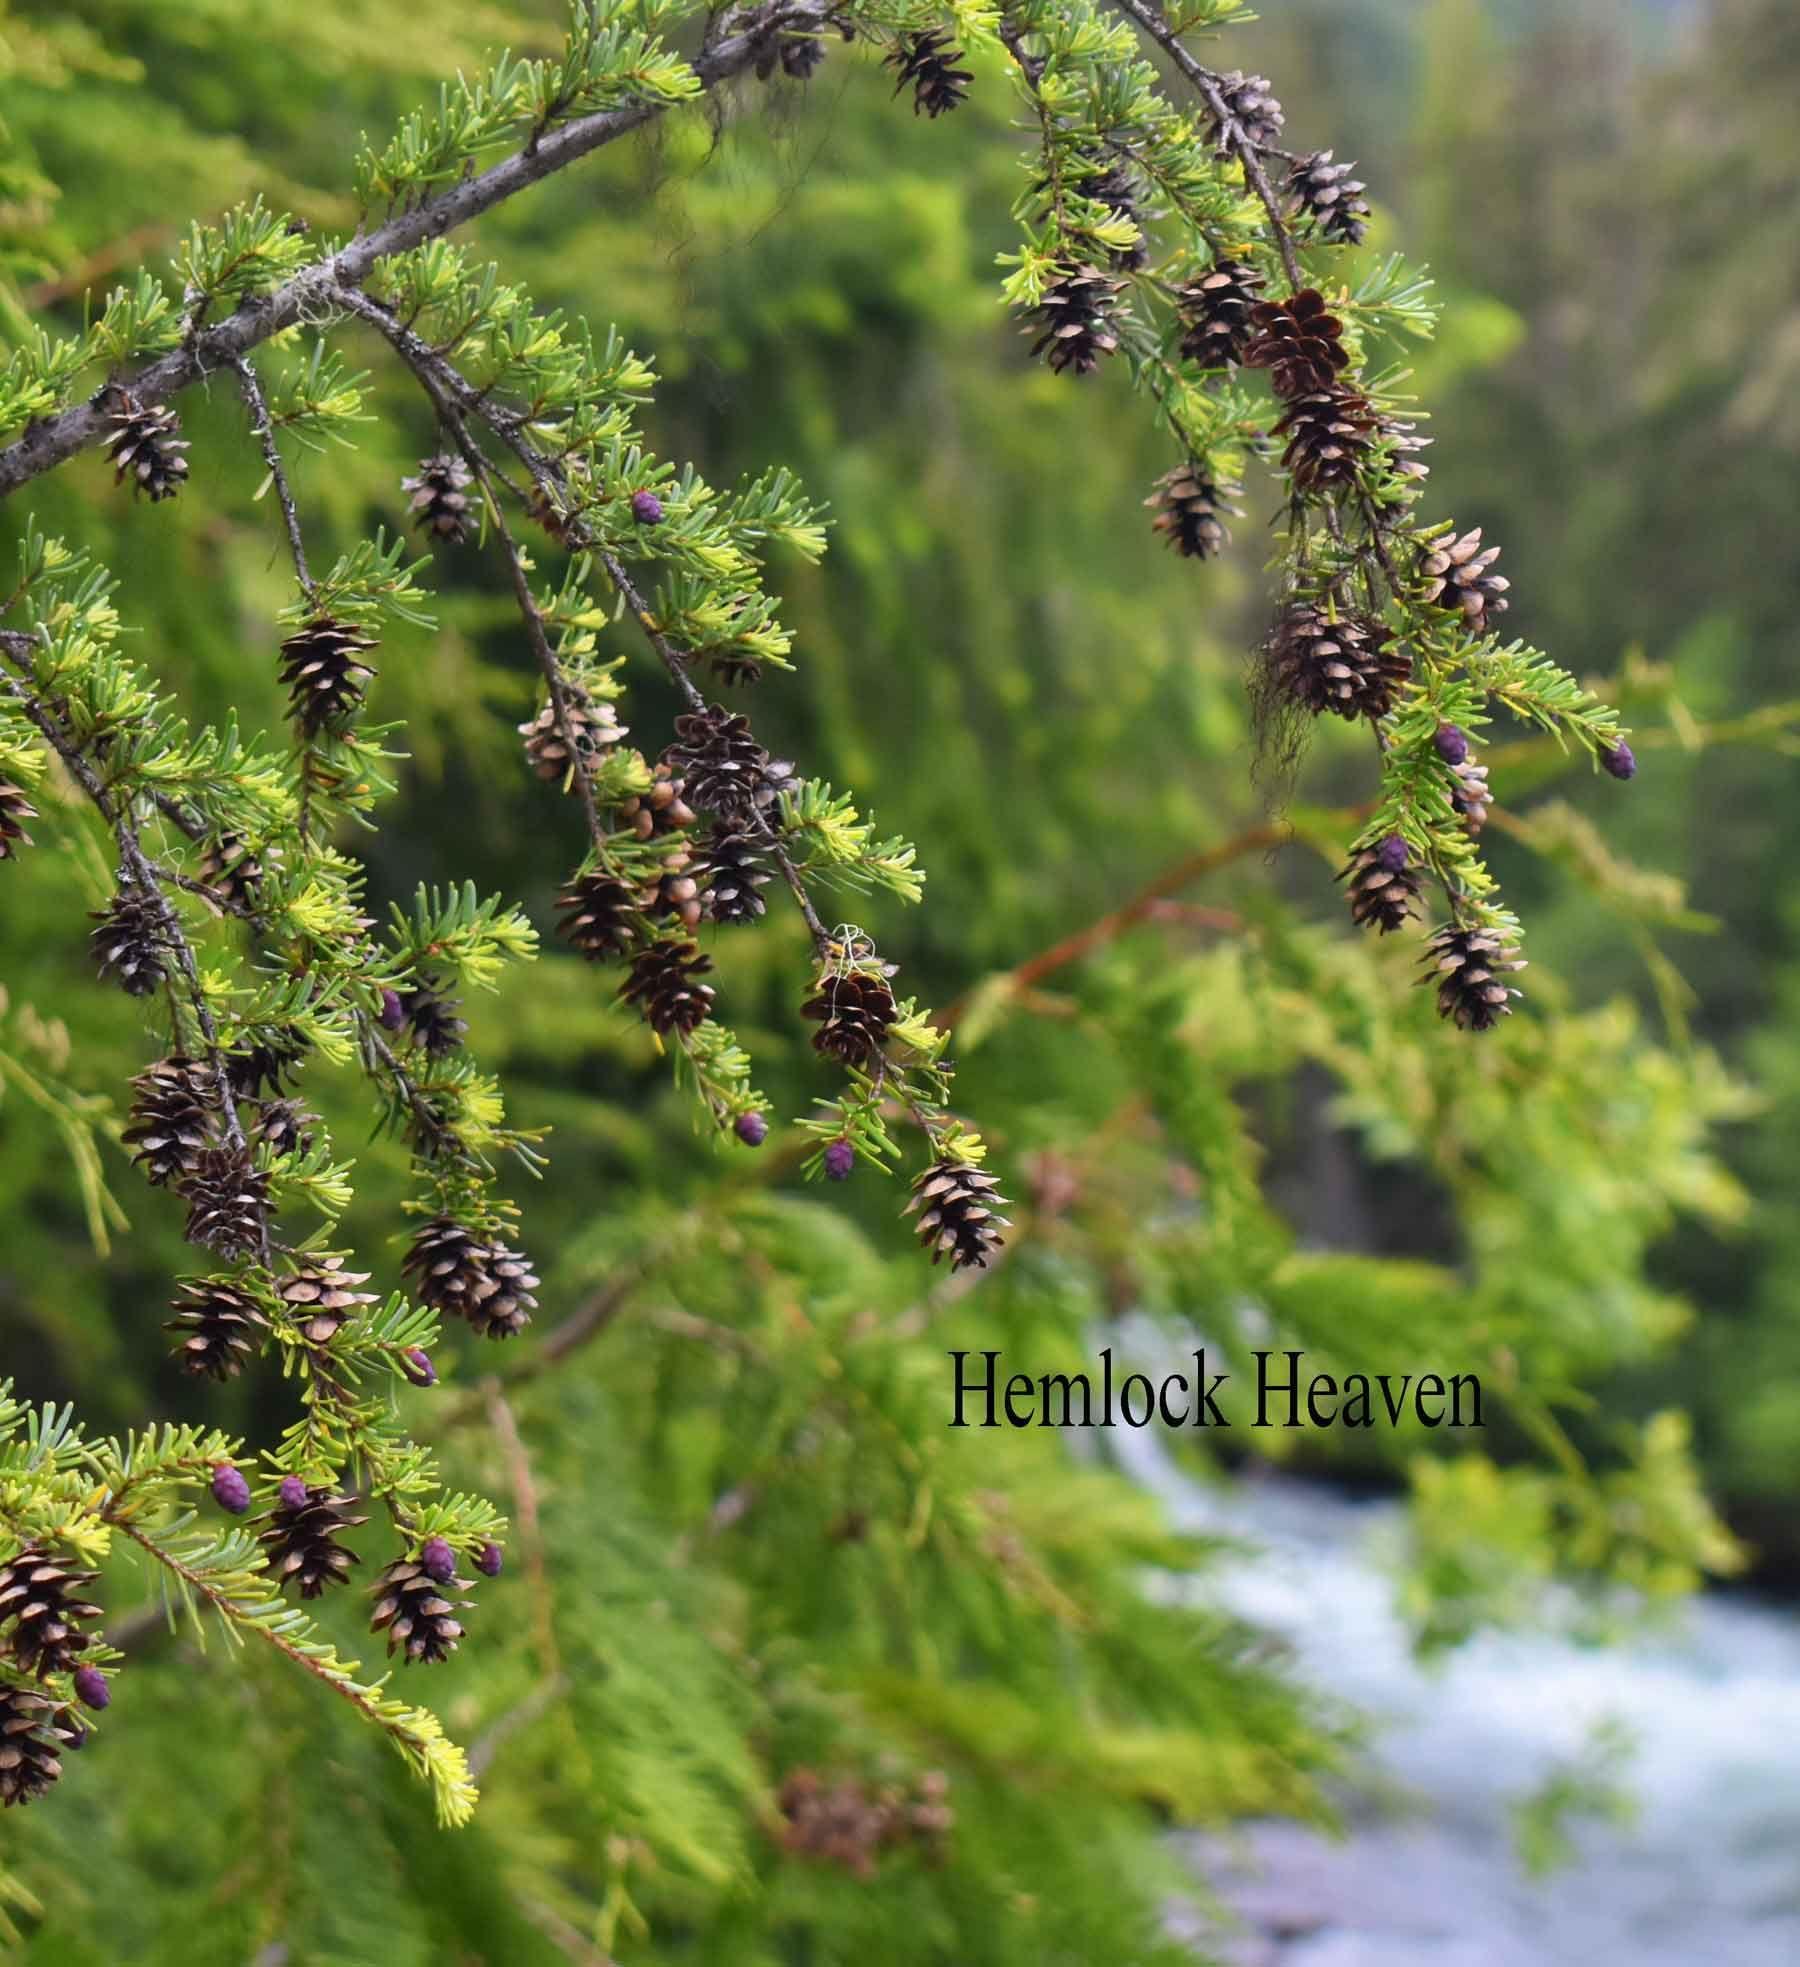 Hemlock Cones Mini Cones Popular For Fillers And Wedding Floral Accents Mini Pine Cones Pine Cone Decorations Hemlock